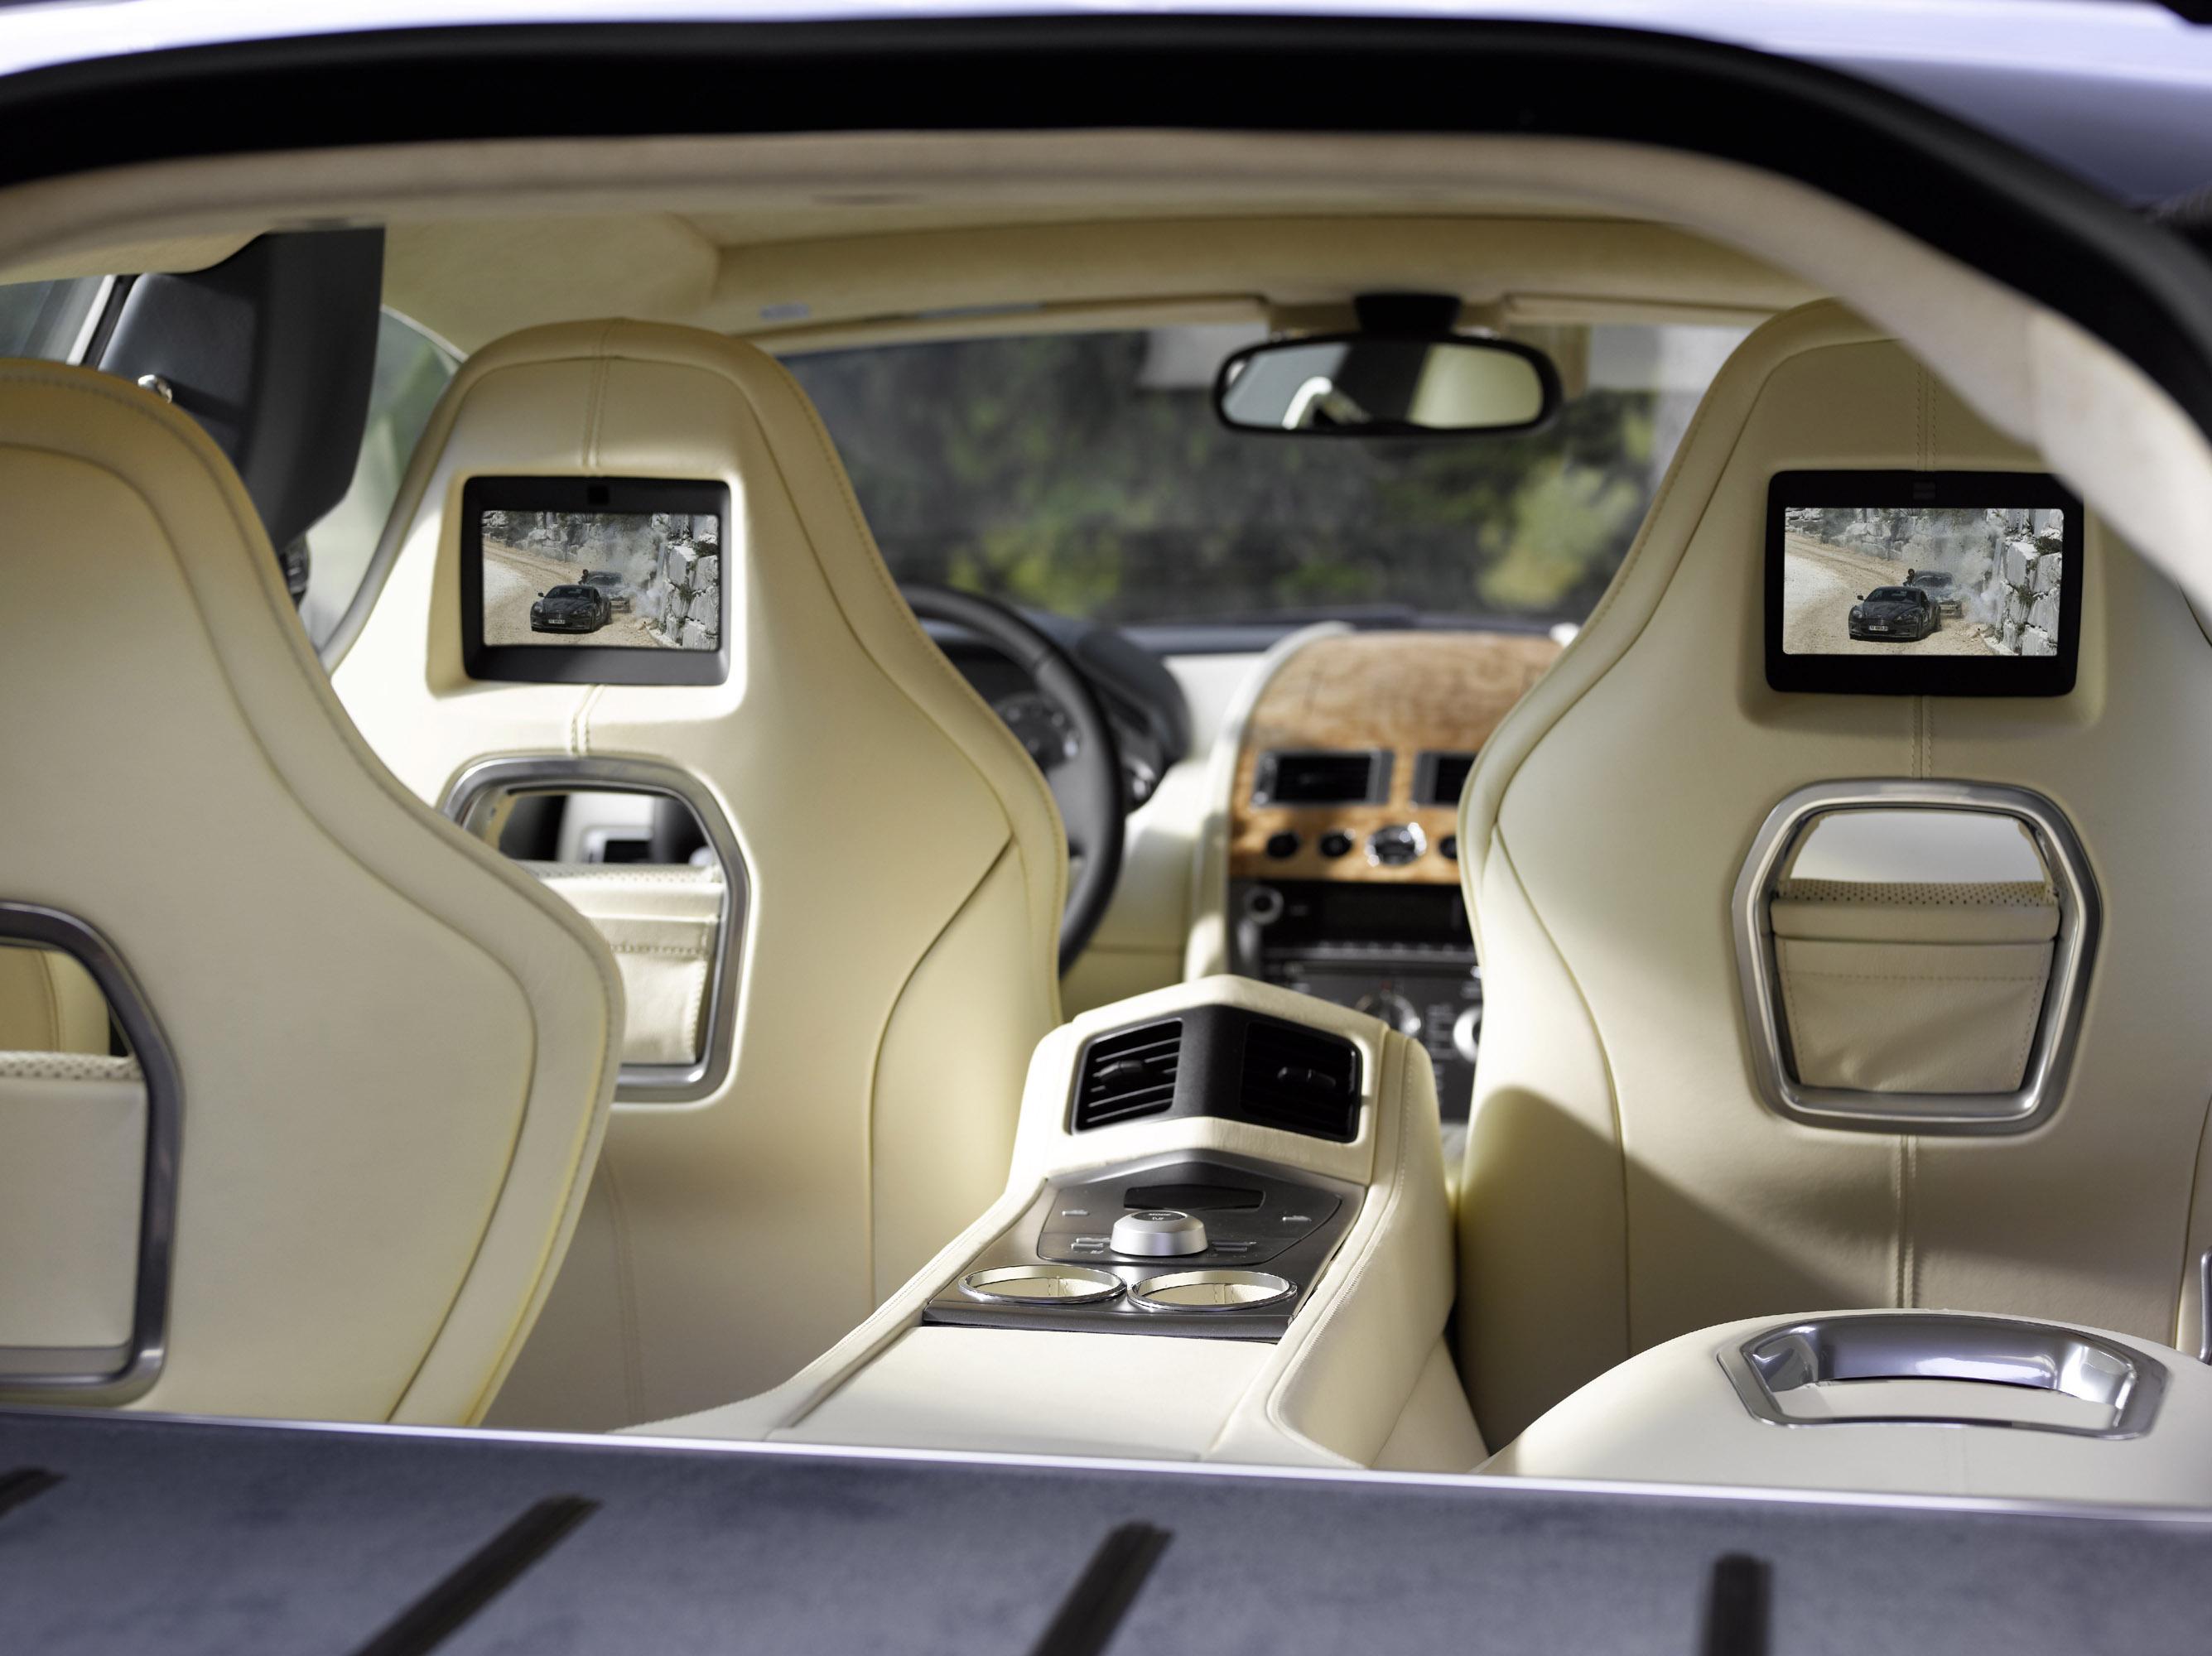 Aston Martin Rapide Pricing Announced - Aston martin price